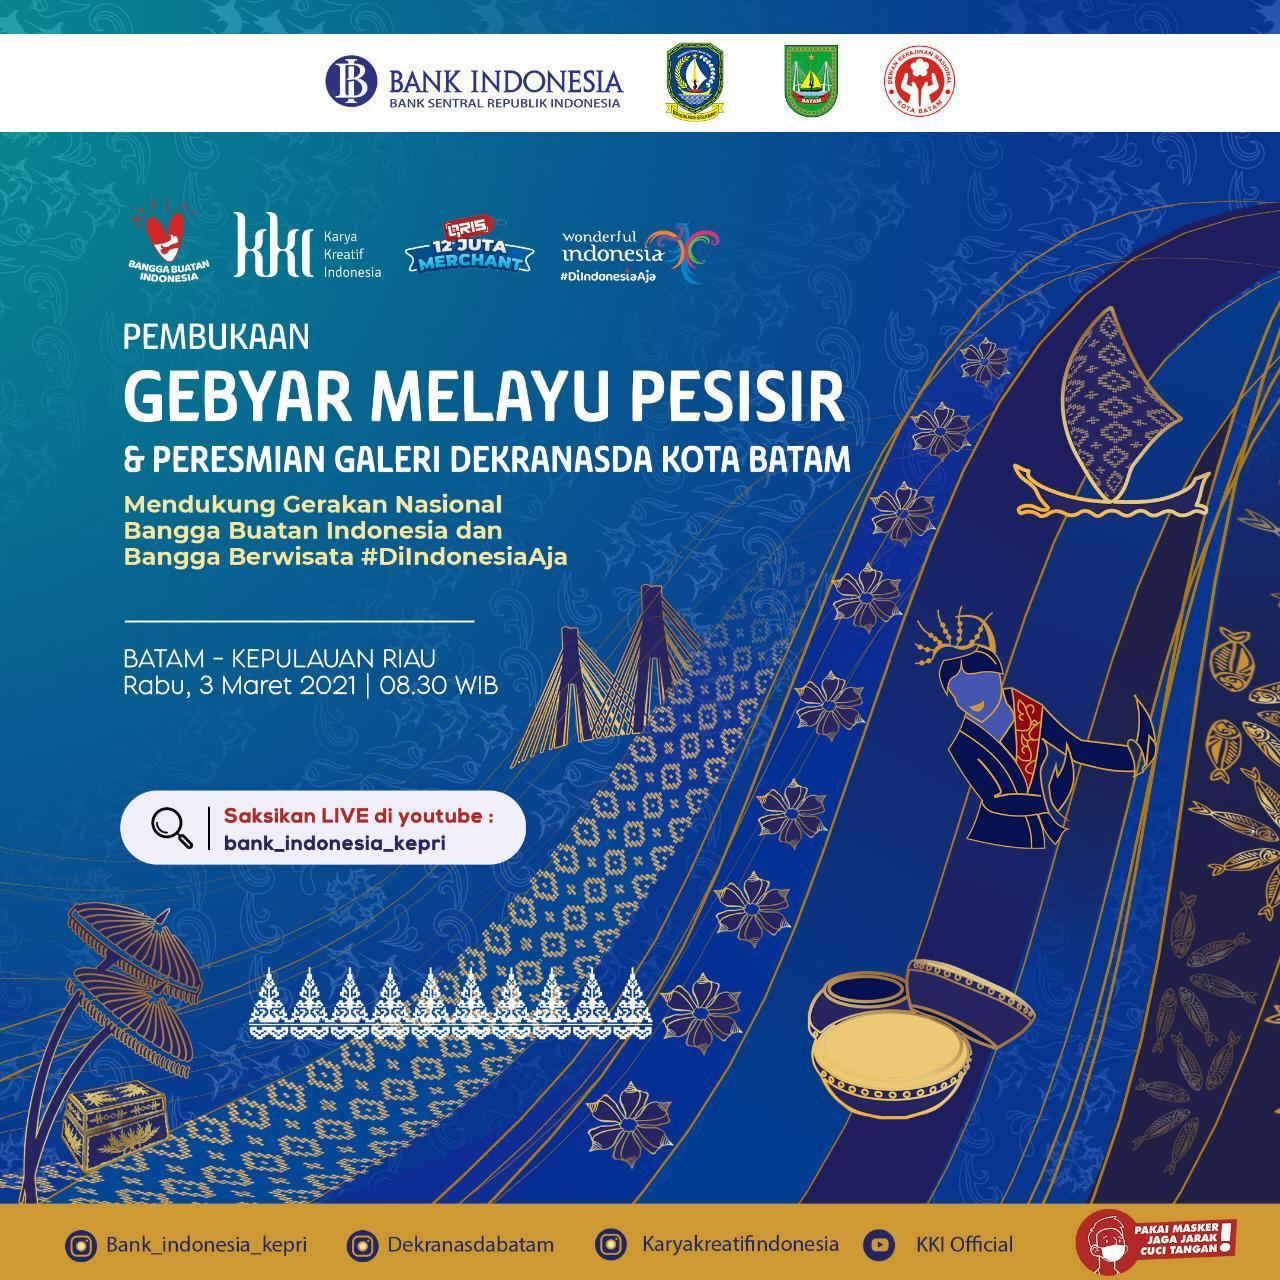 Disperindag dan Dekranasda Kota Batam Bersama BI Gelar  Gebyar Melayu Pesisir dan Peresmian Galeri Dekranasda Batam